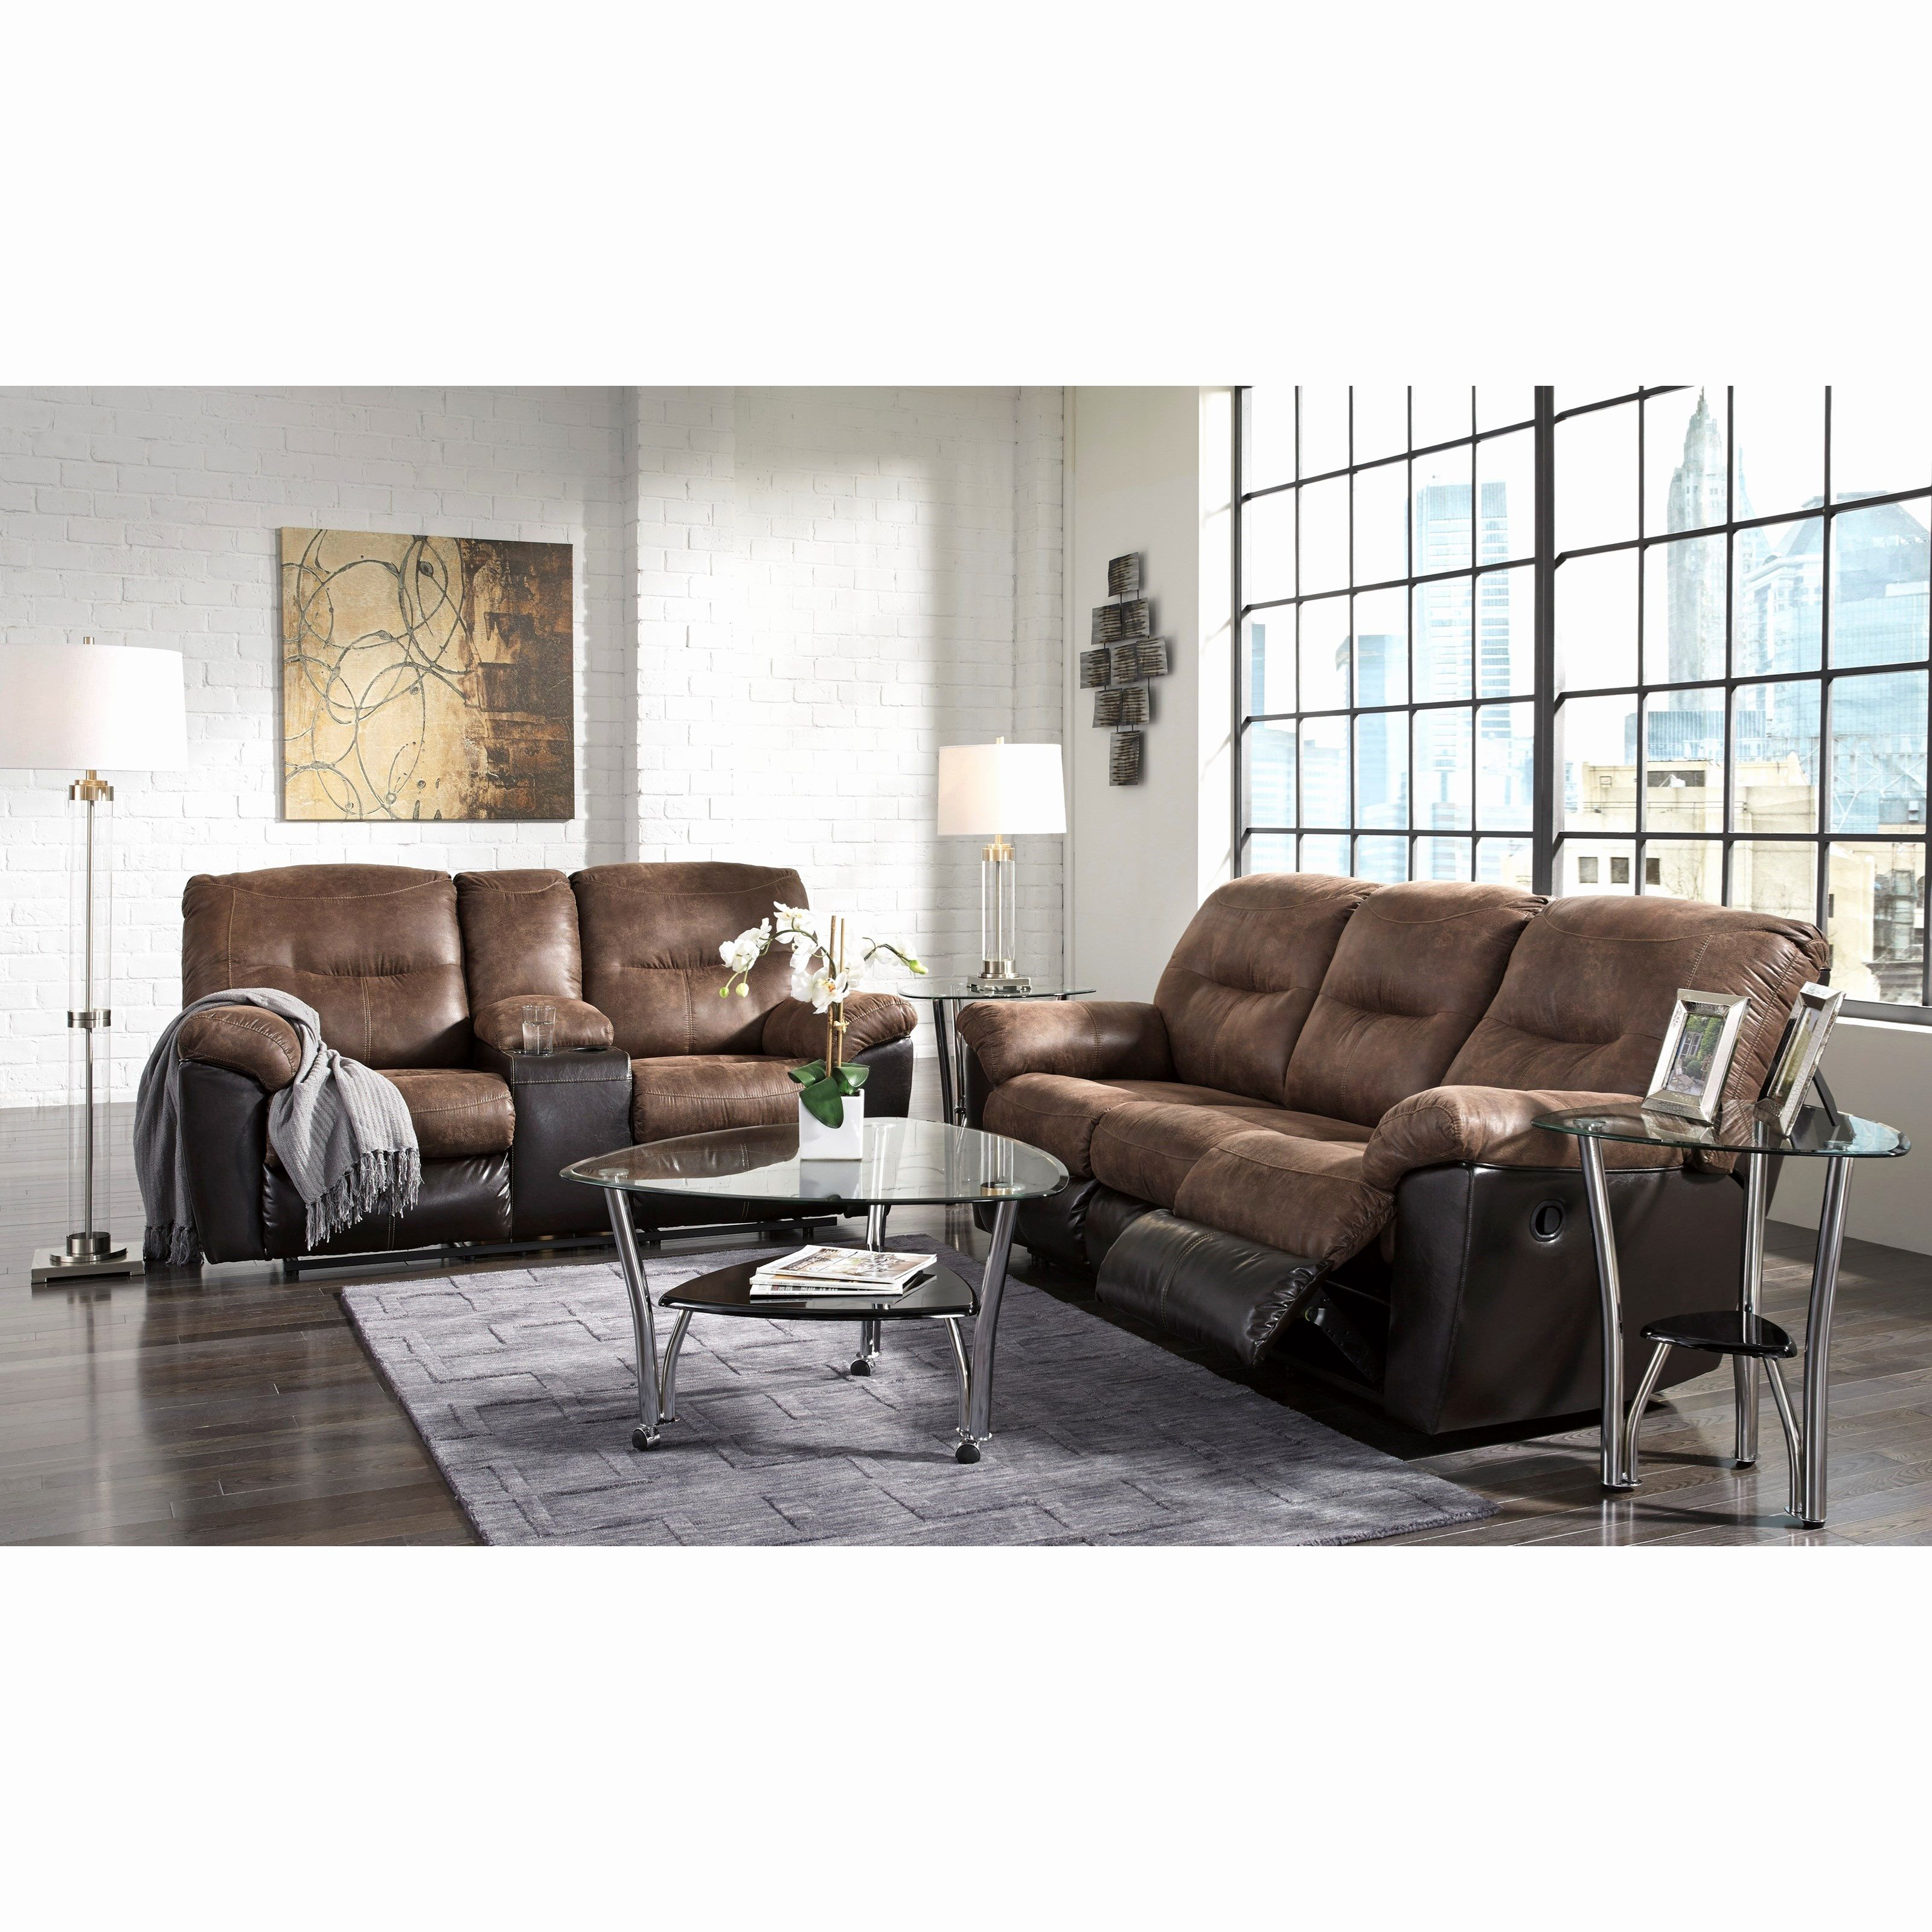 Elegant Microfiber Reclining Sofa And Loveseat Microfiber